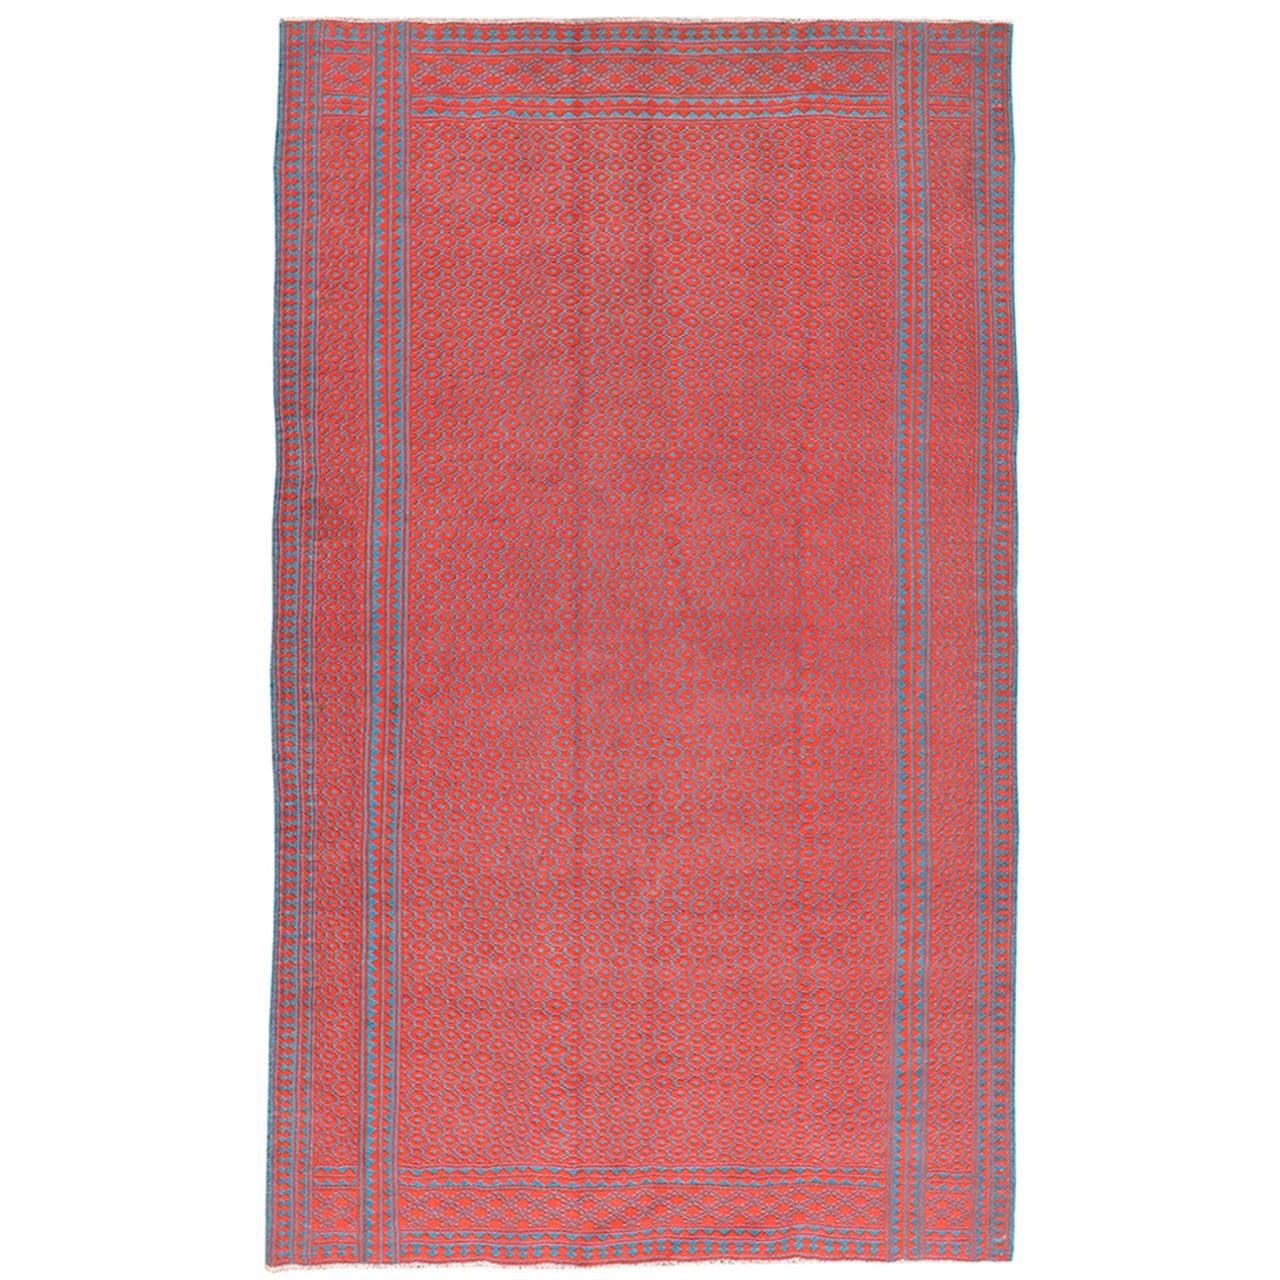 Vintage Persian Reversible Flat-Weave Kilim Rug